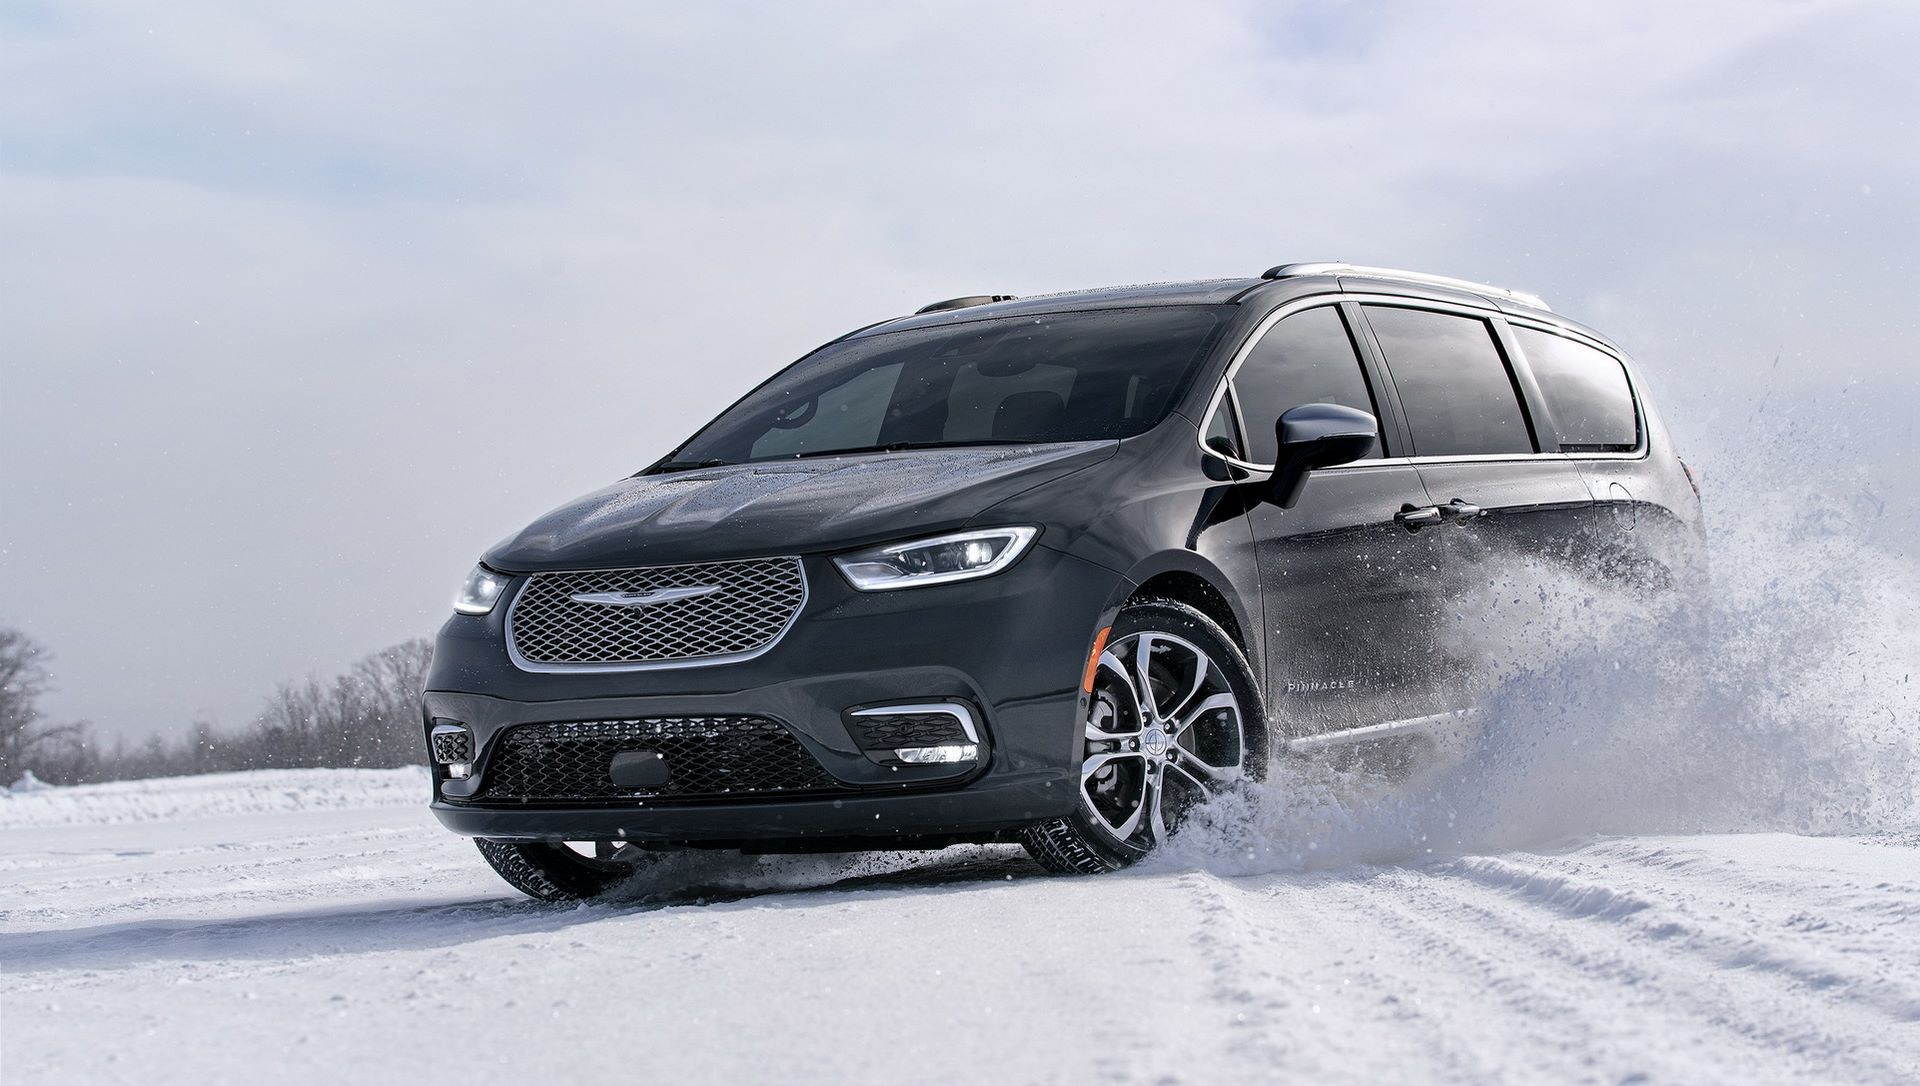 2021-Chrysler-Pacifica-51